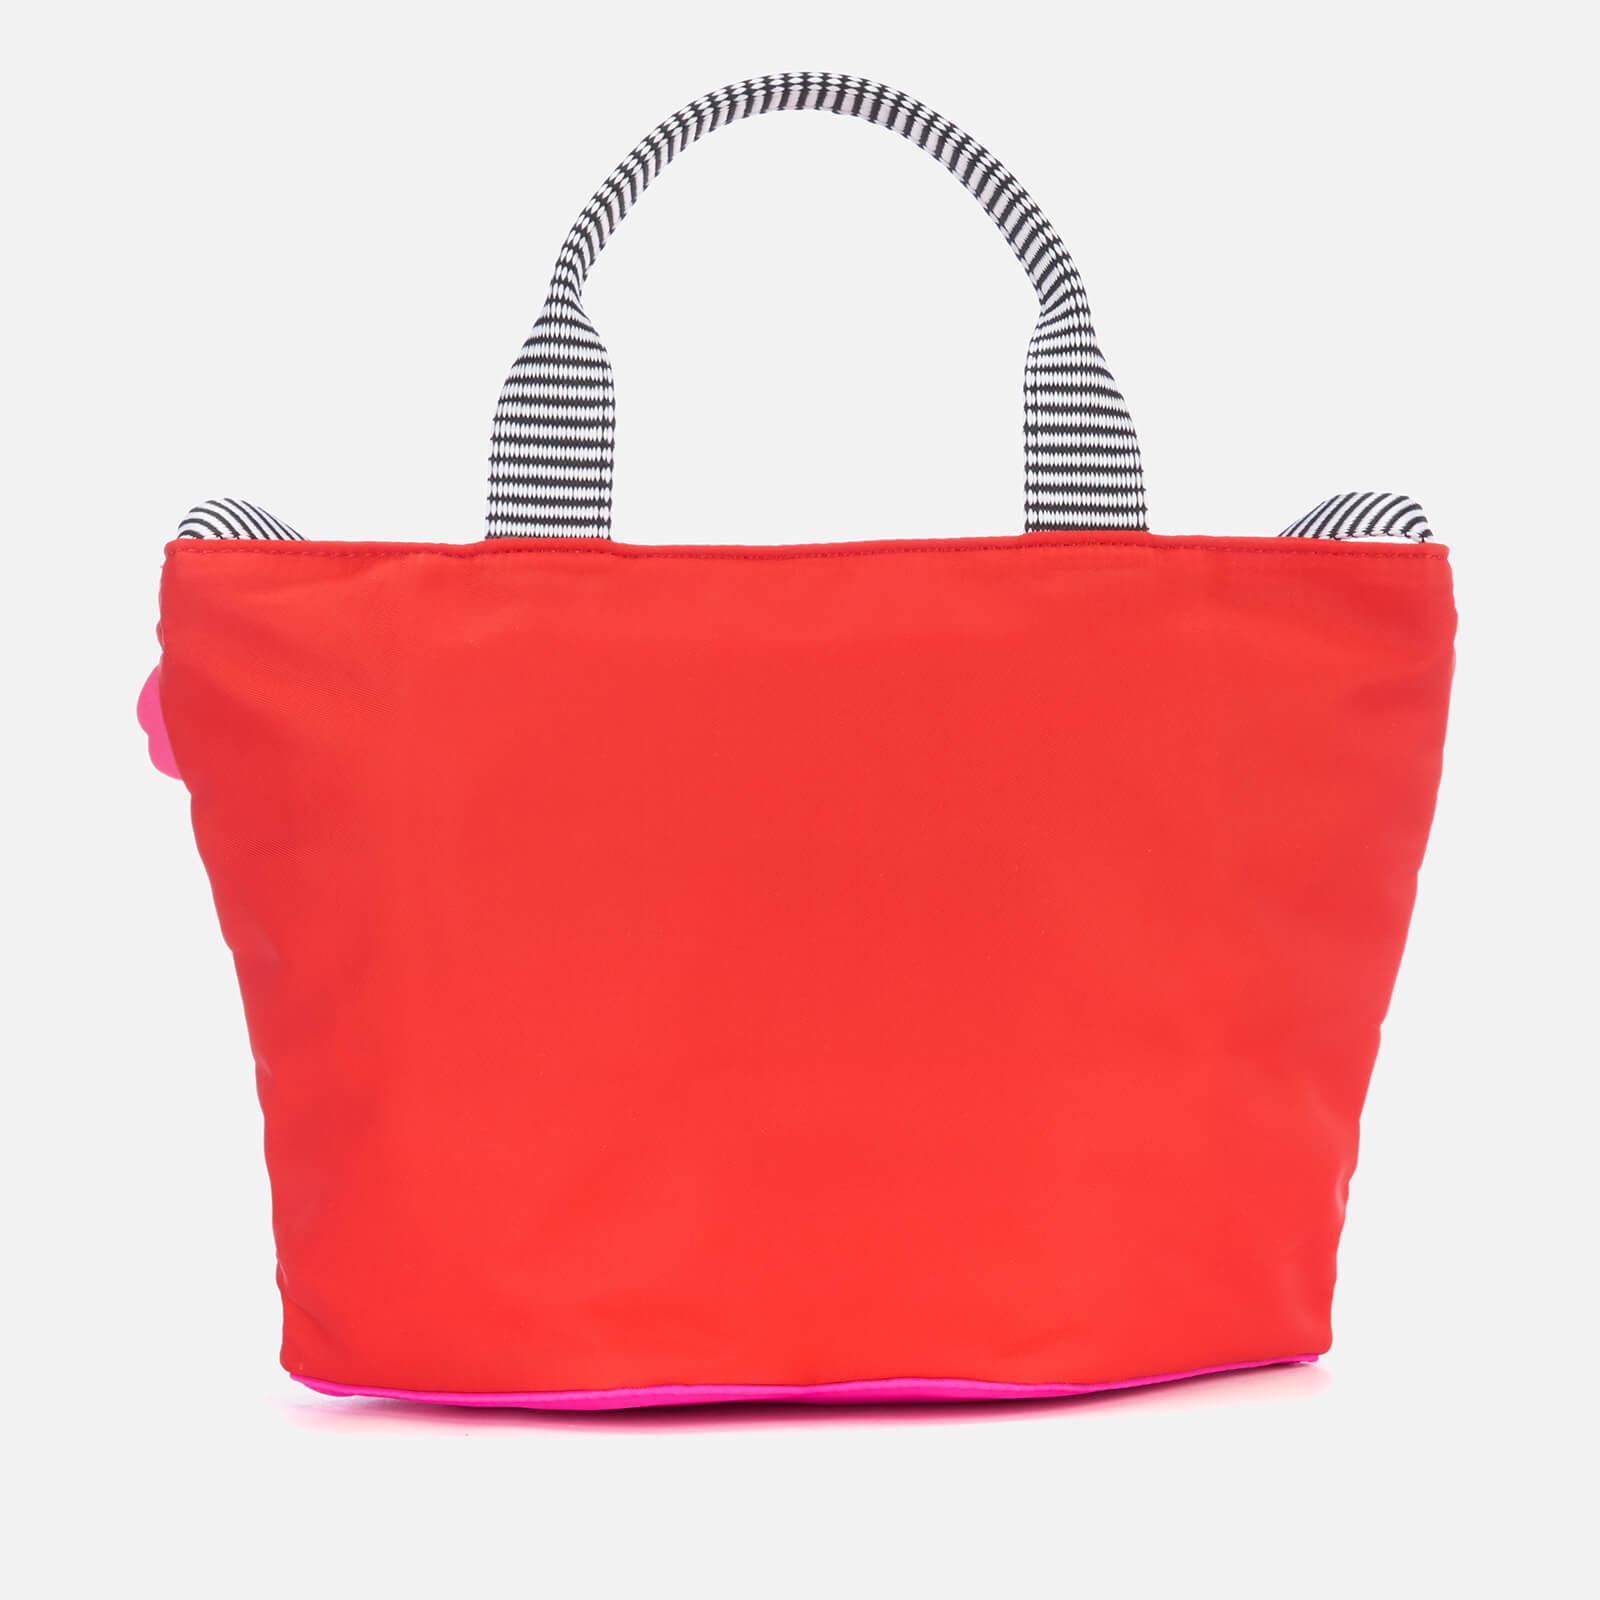 2110df9f8c7b Lyst - Lulu Guinness Small Lip Base Lola Cross Body Bag in Red